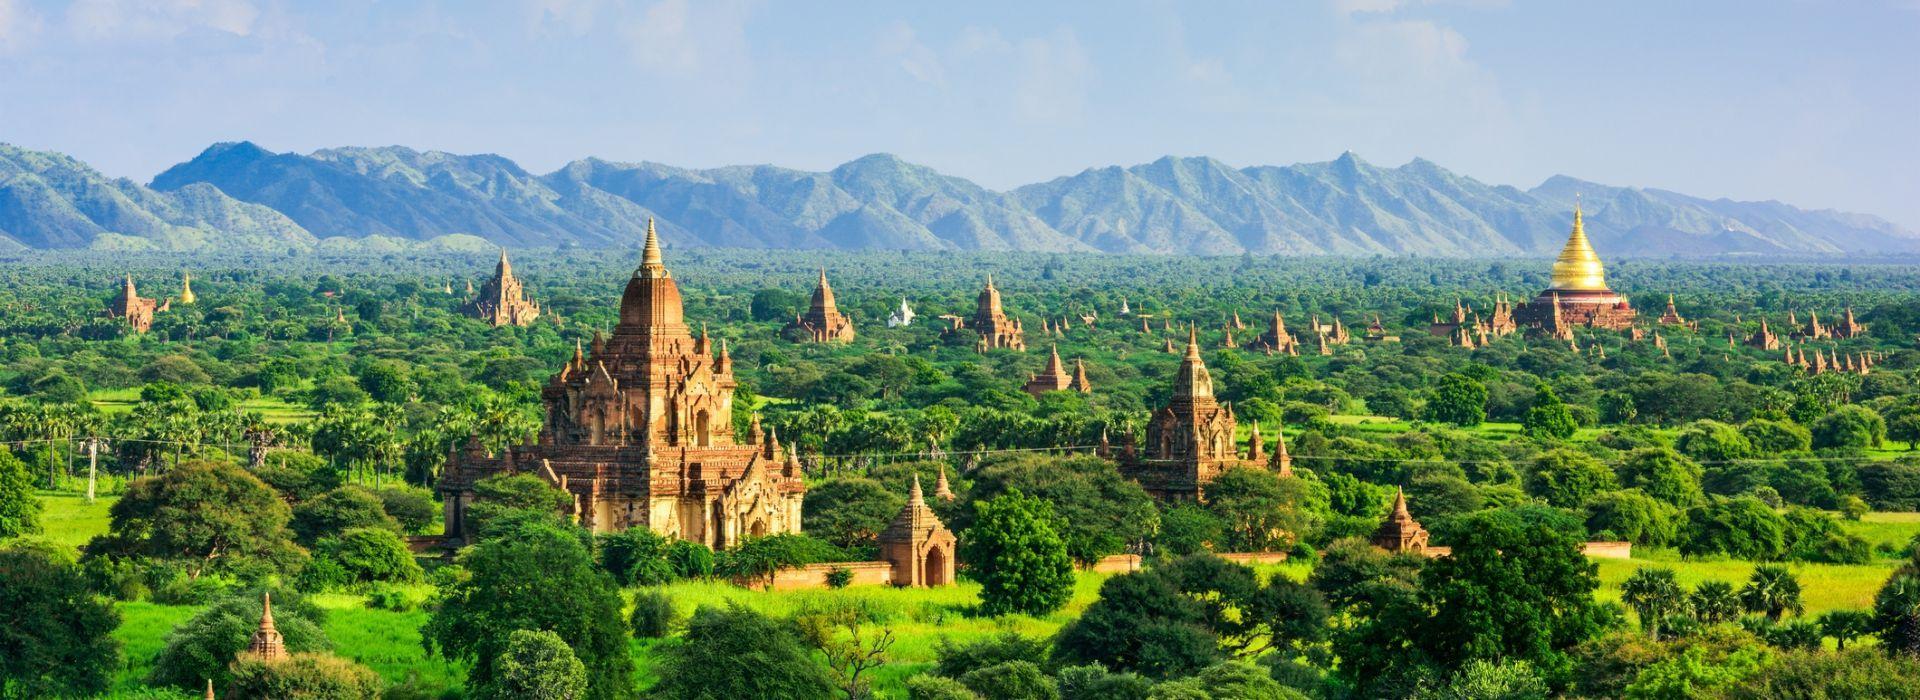 Walking tours in Myanmar